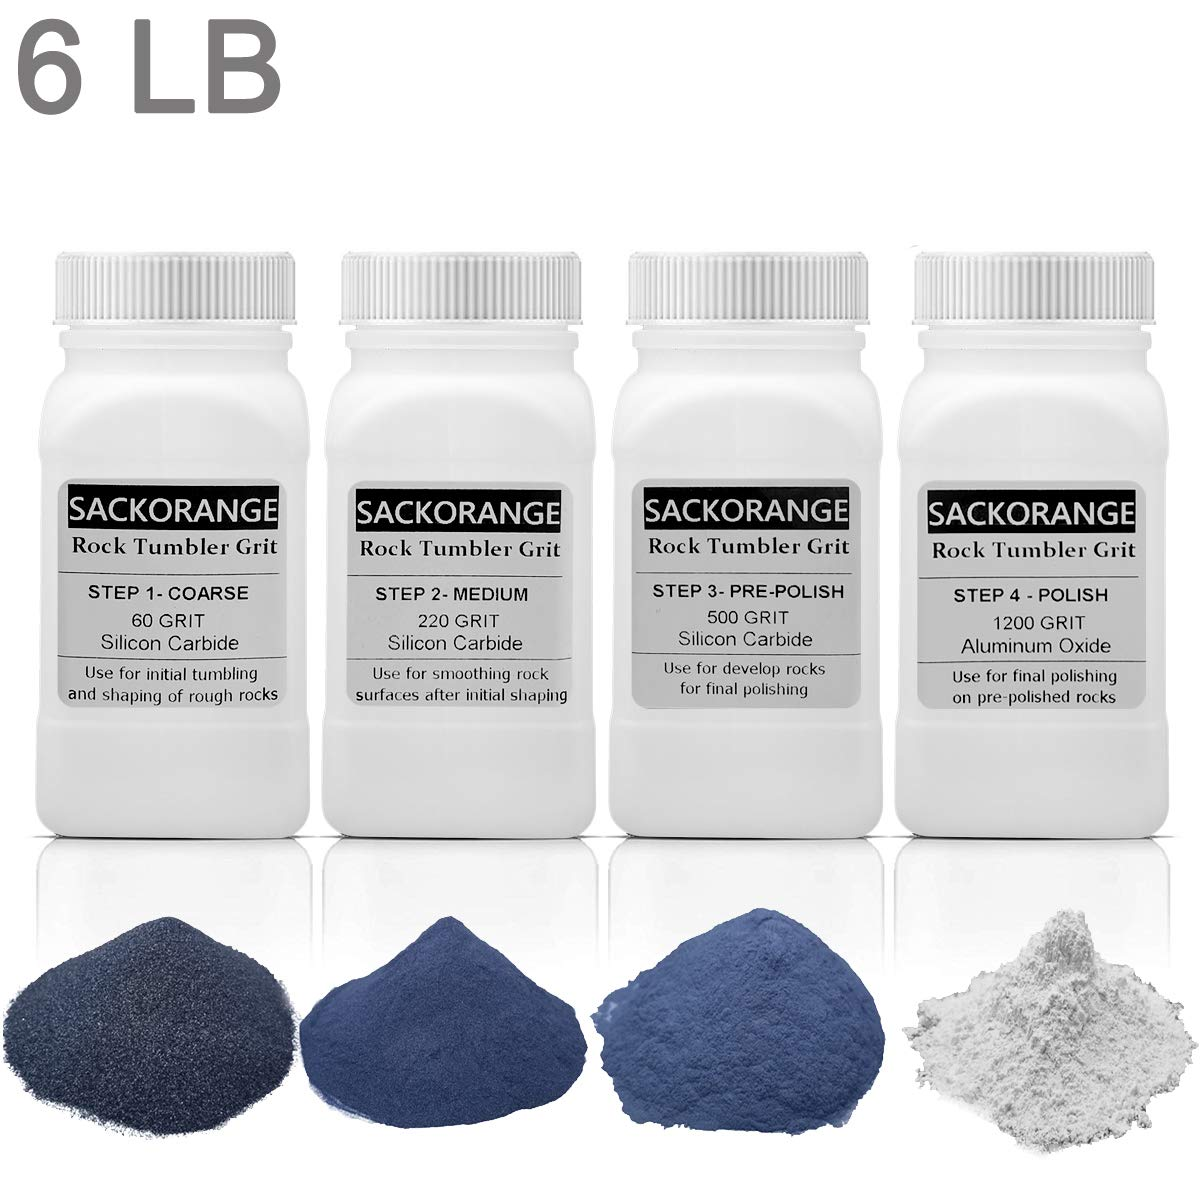 Sackorange 6 Pounds 4 Bottles Rock Tumbler Refill Grit Media Kit   4-Steps for Tumbling Stones, Compatible with National Geographic, Thumler, and Lortone Tumblers (6 LB Assortment) by SACKORANGE